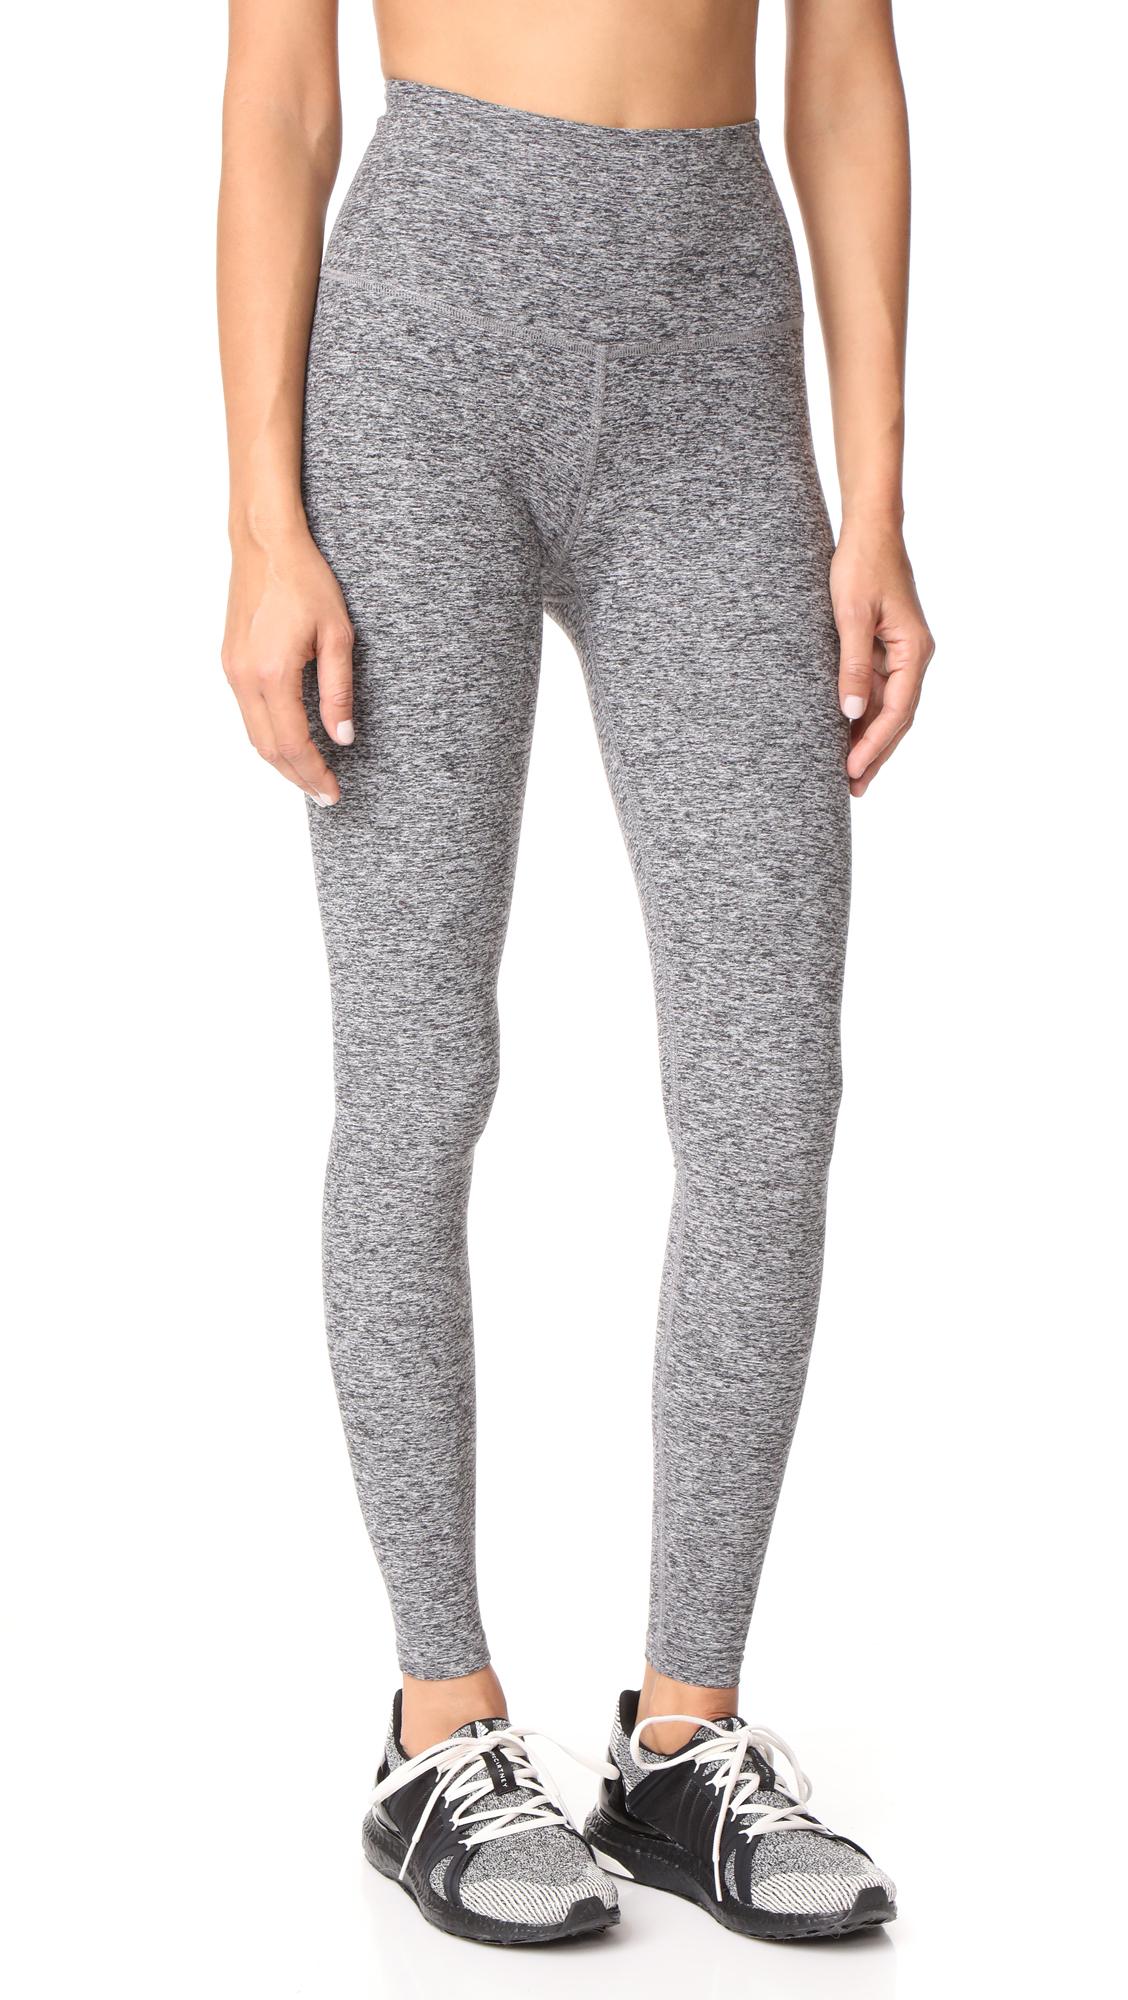 Beyond Yoga High Waist Long Leggings - Black/White Space Dye